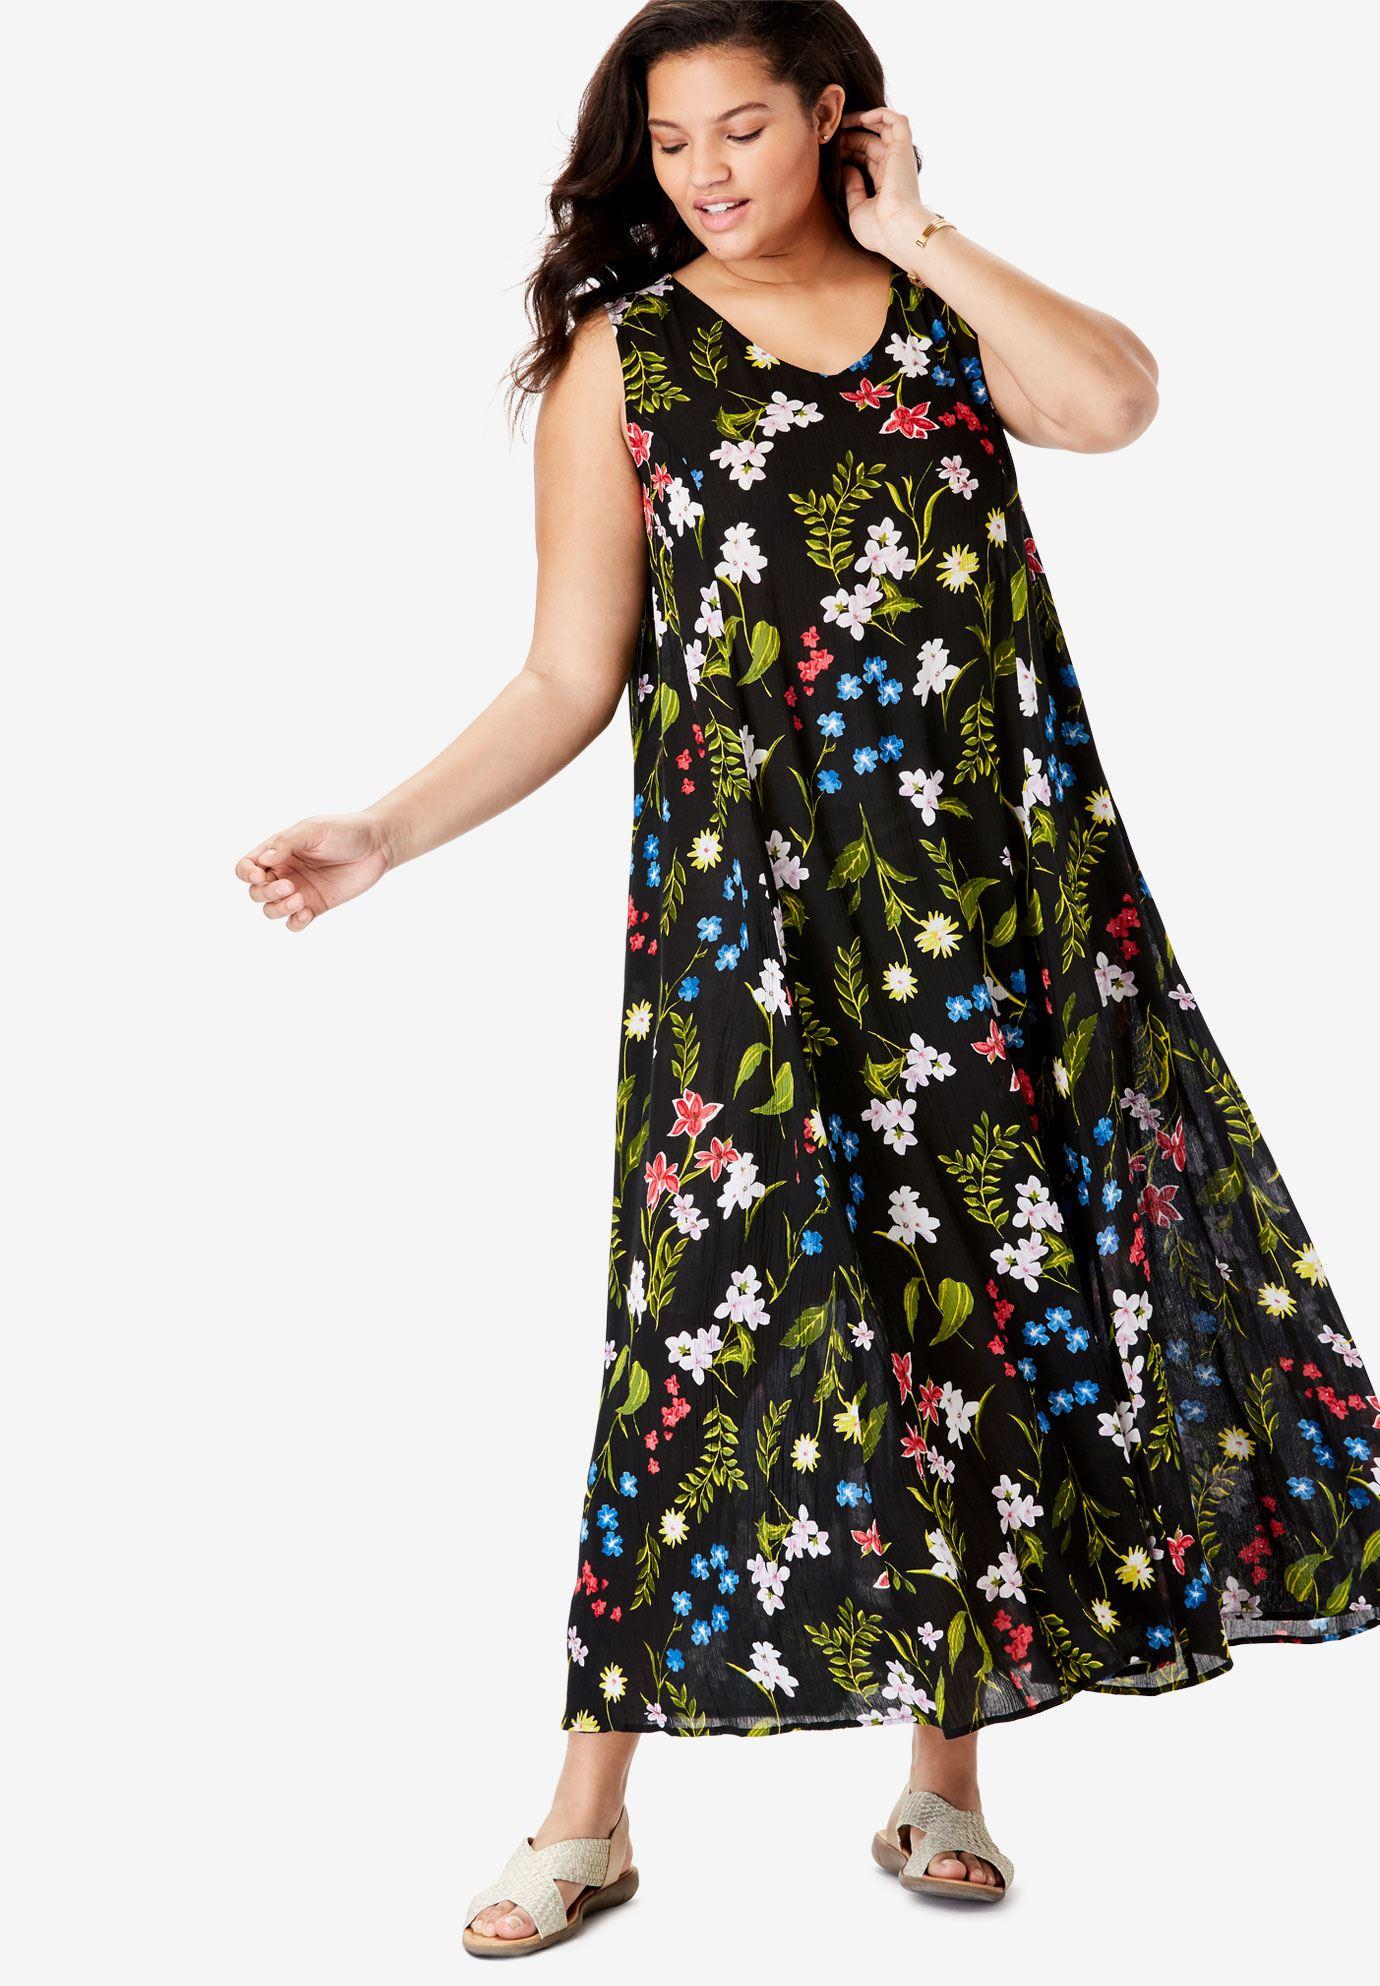 b9f590b98 Sleeveless Crinkle A-Line Dress| Plus Size Casual Dresses | Full Beauty